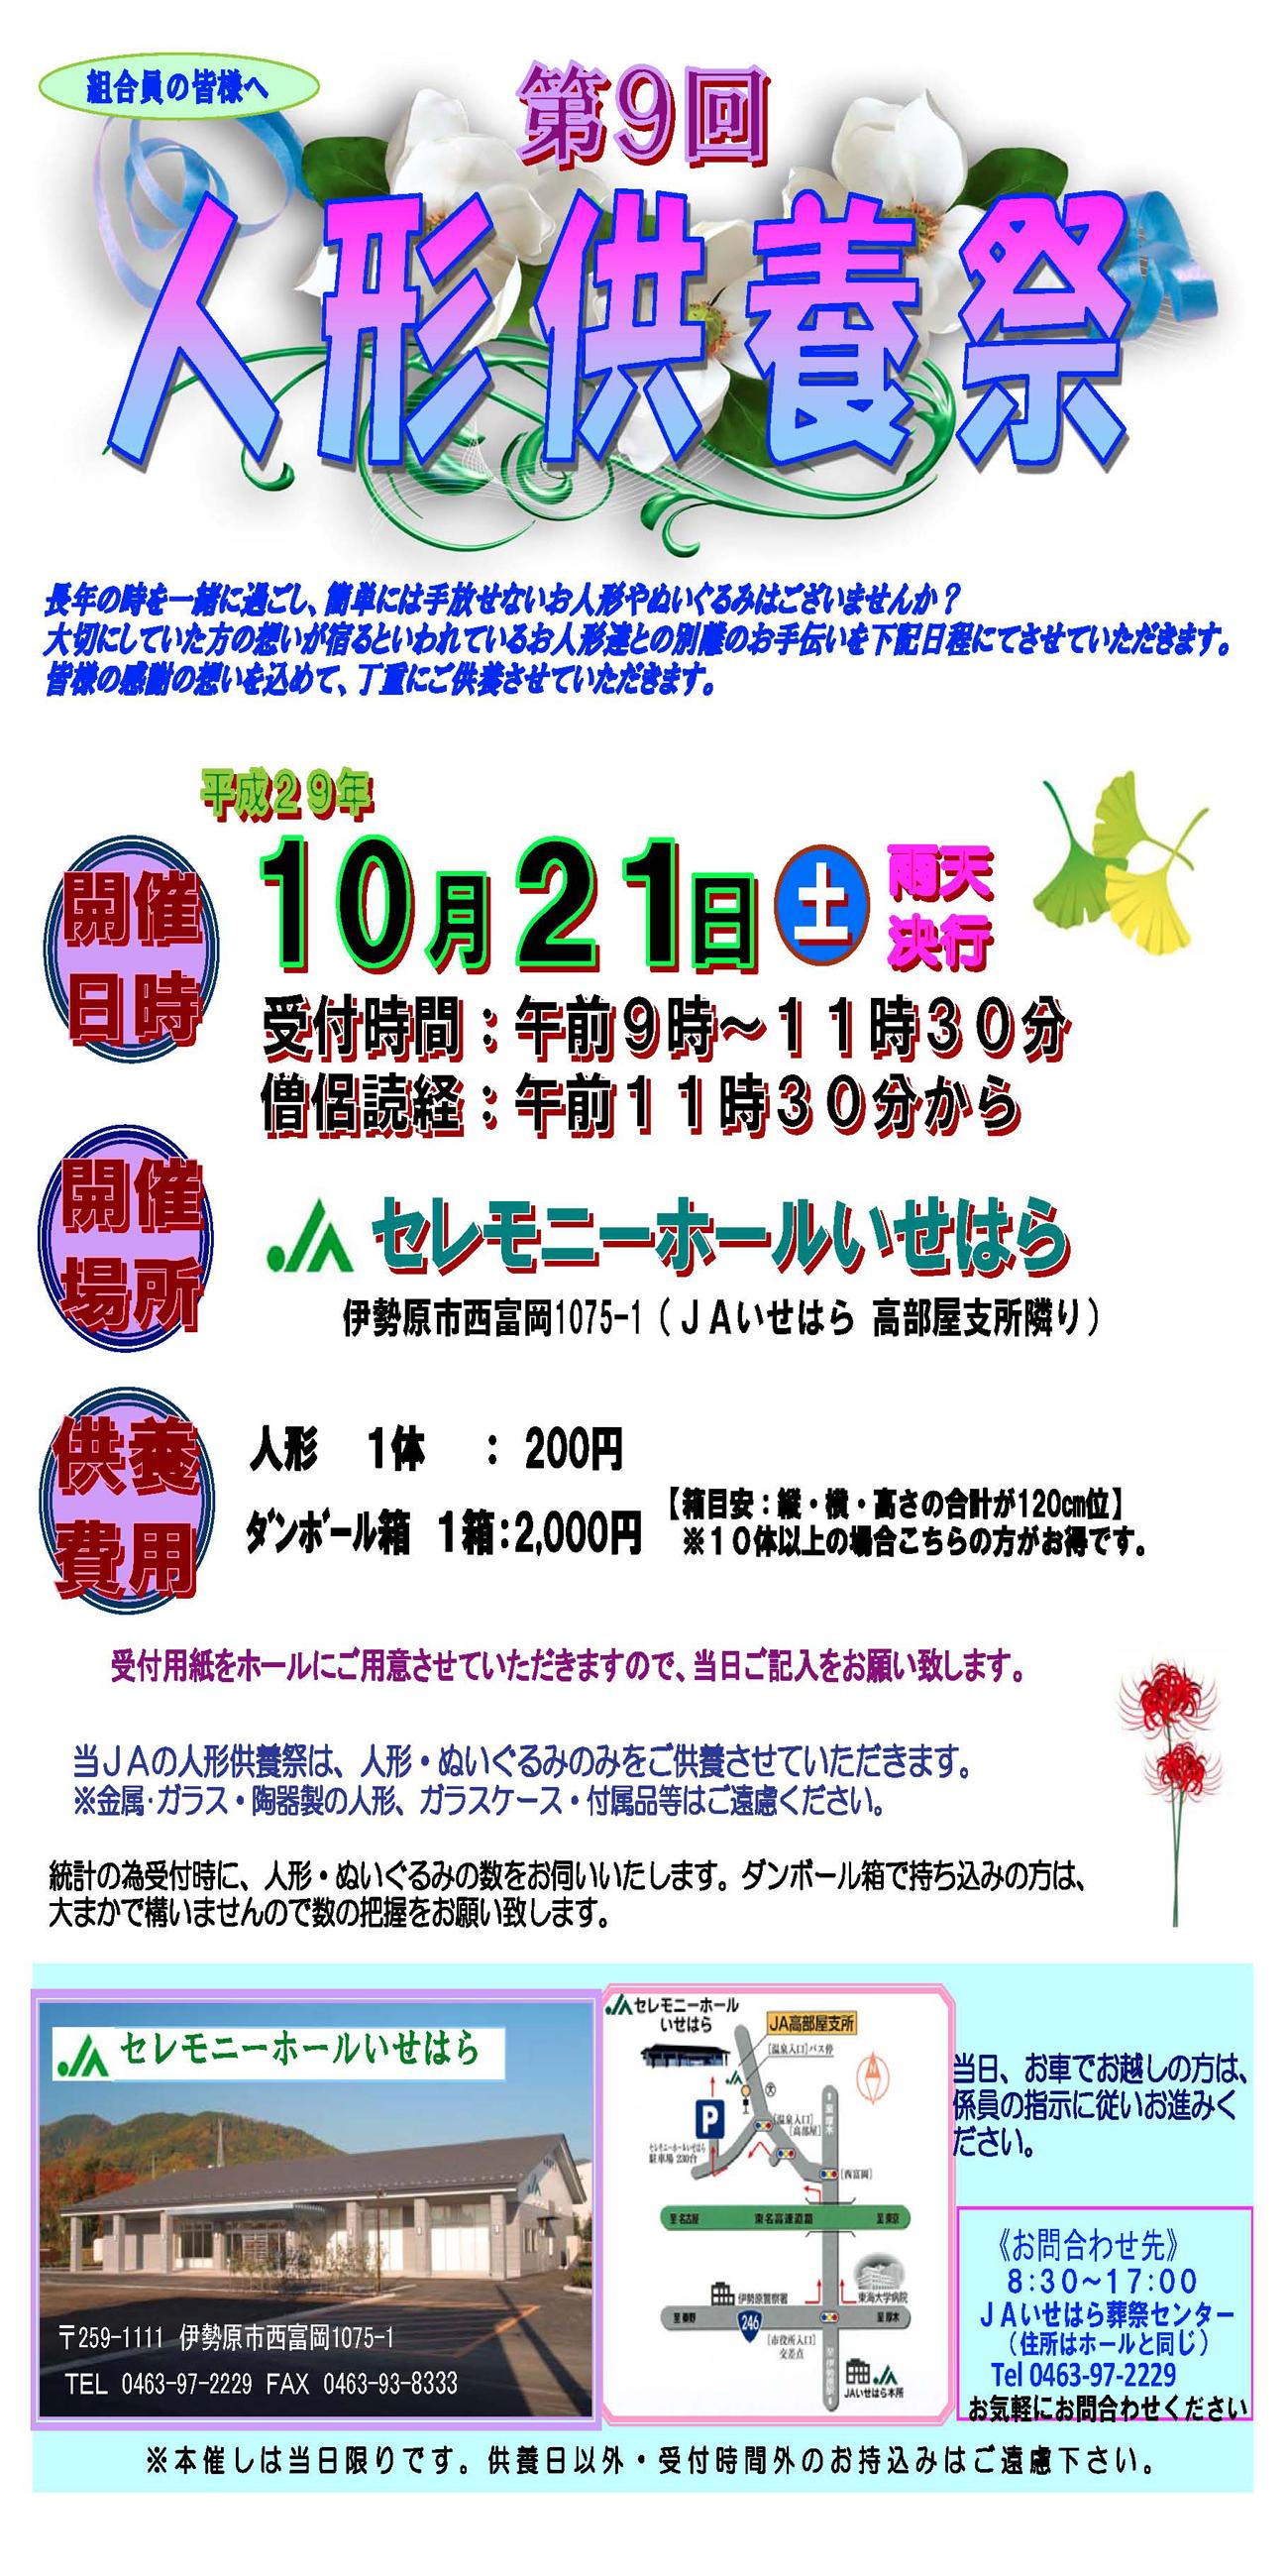 【H29.10.21(土)】JAセレモニーホールいせはら第9回人形供養祭